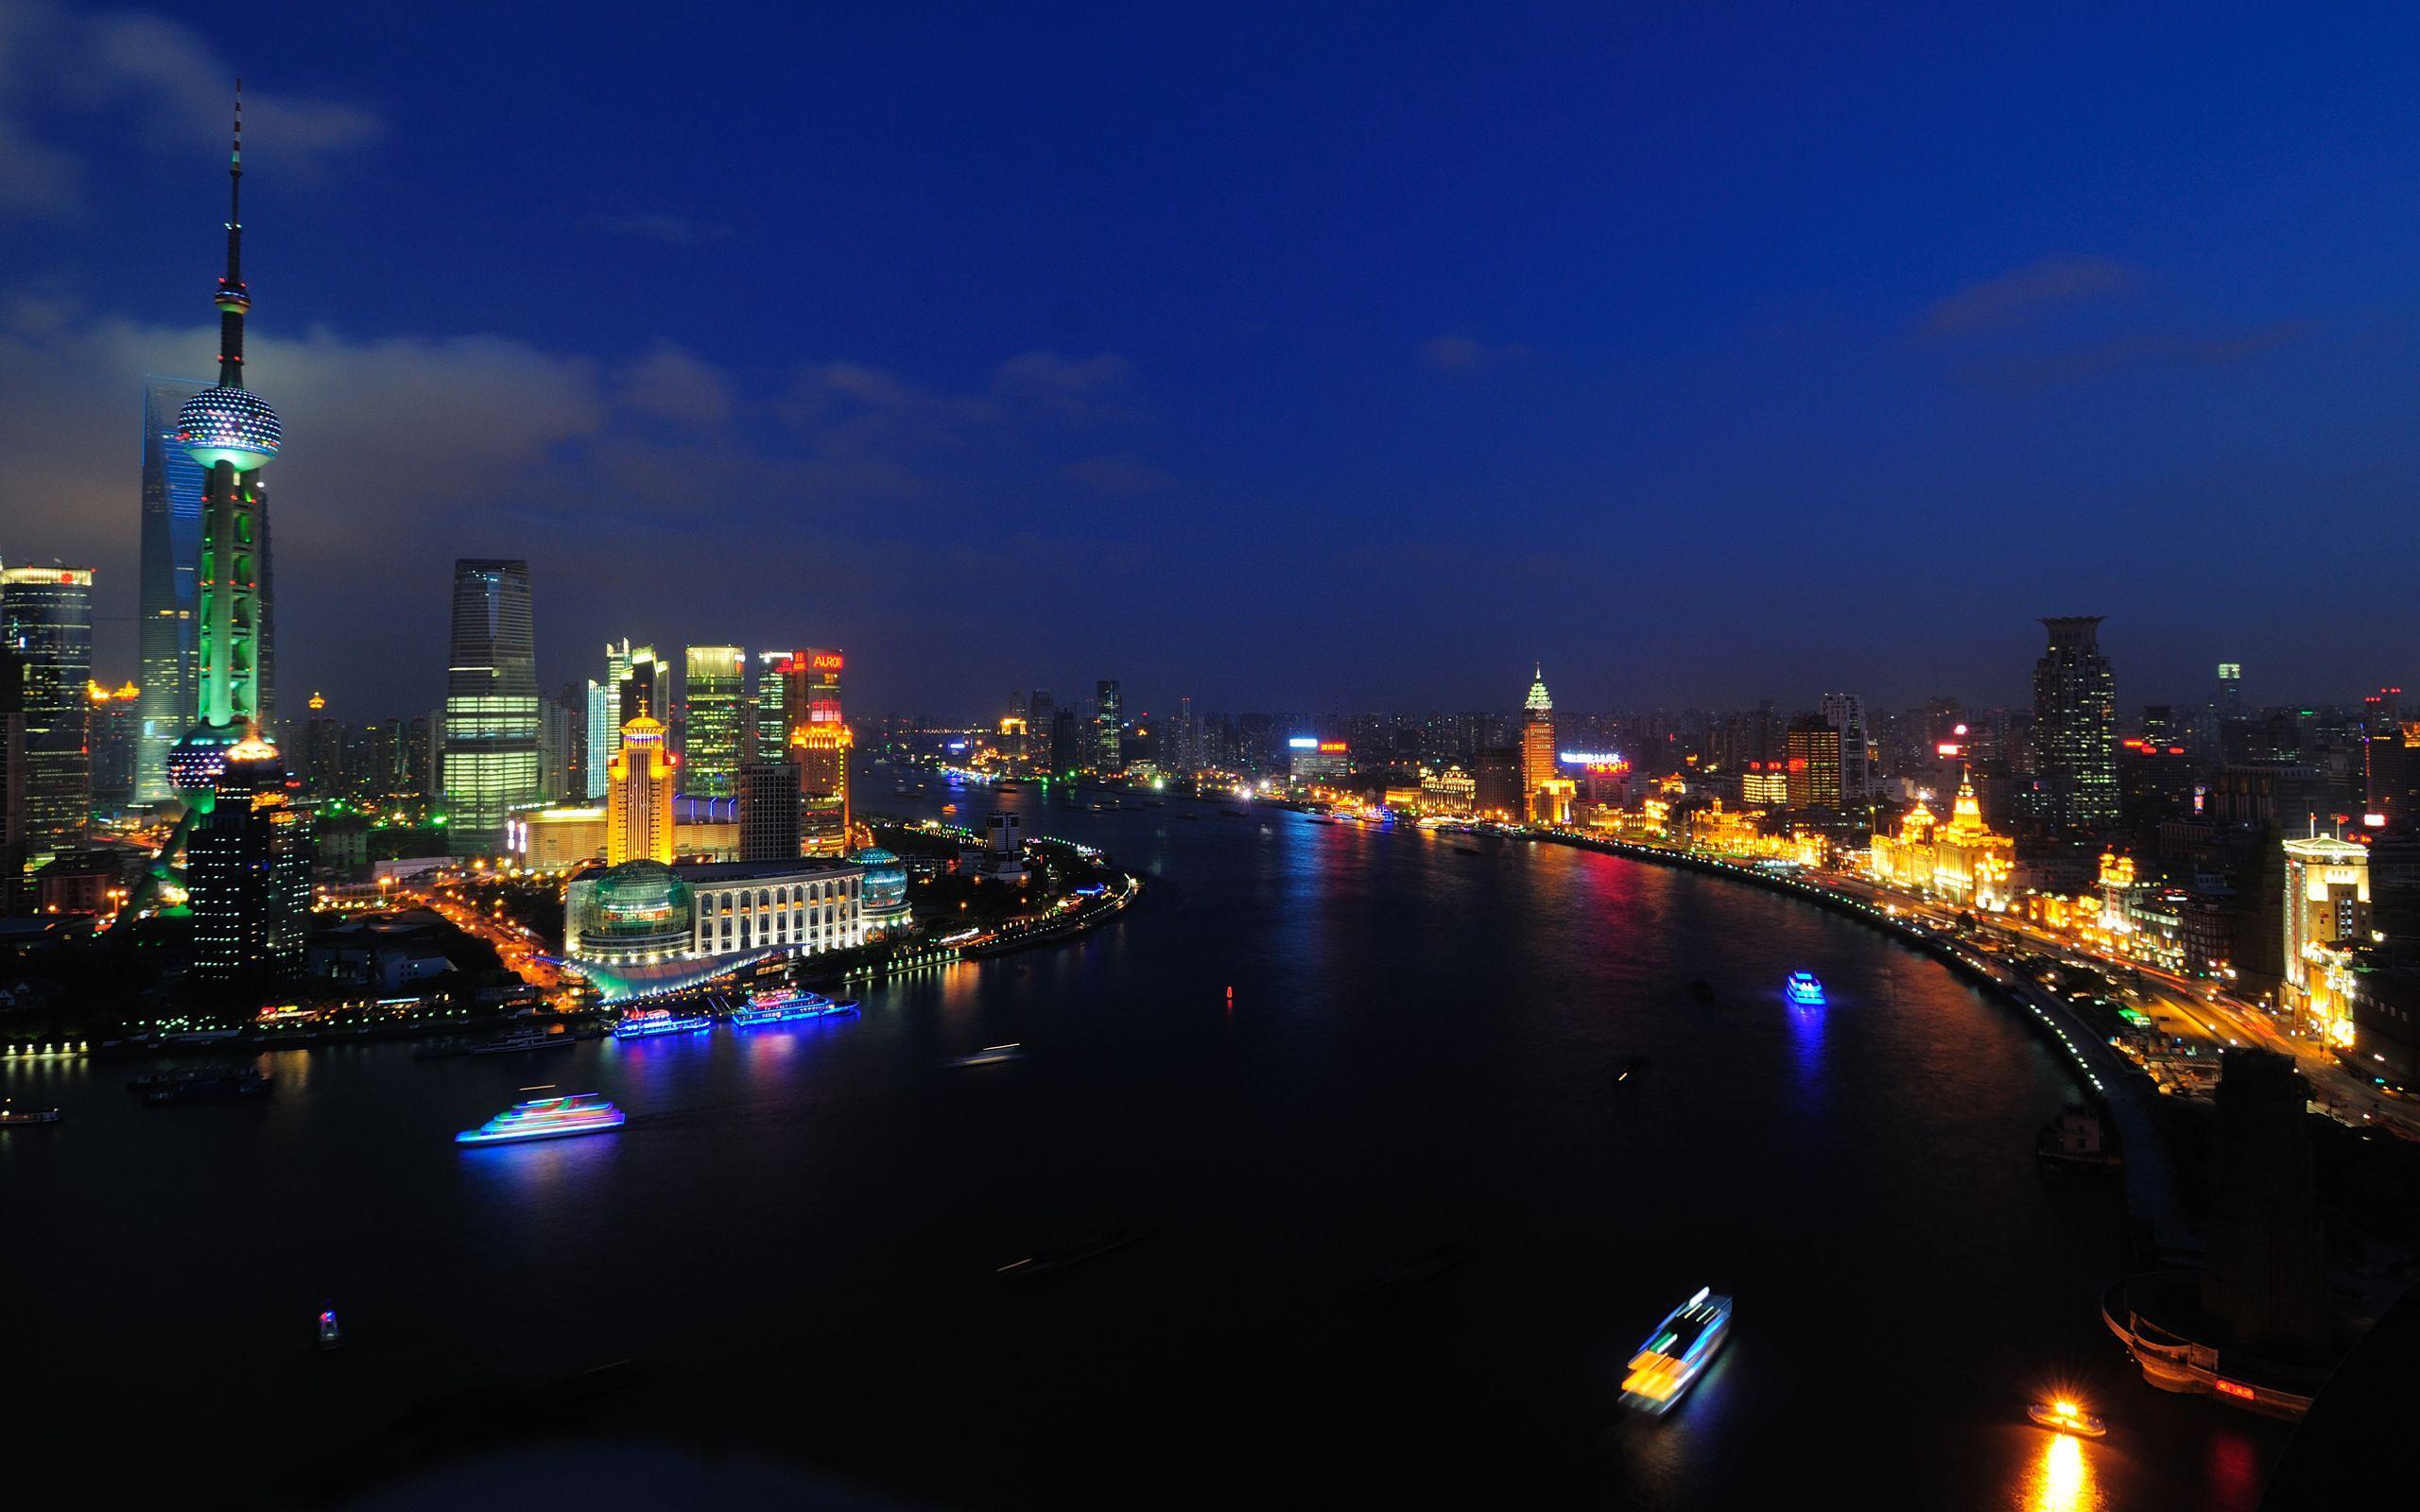 Shanghai Wallpapers - Top Free Shanghai